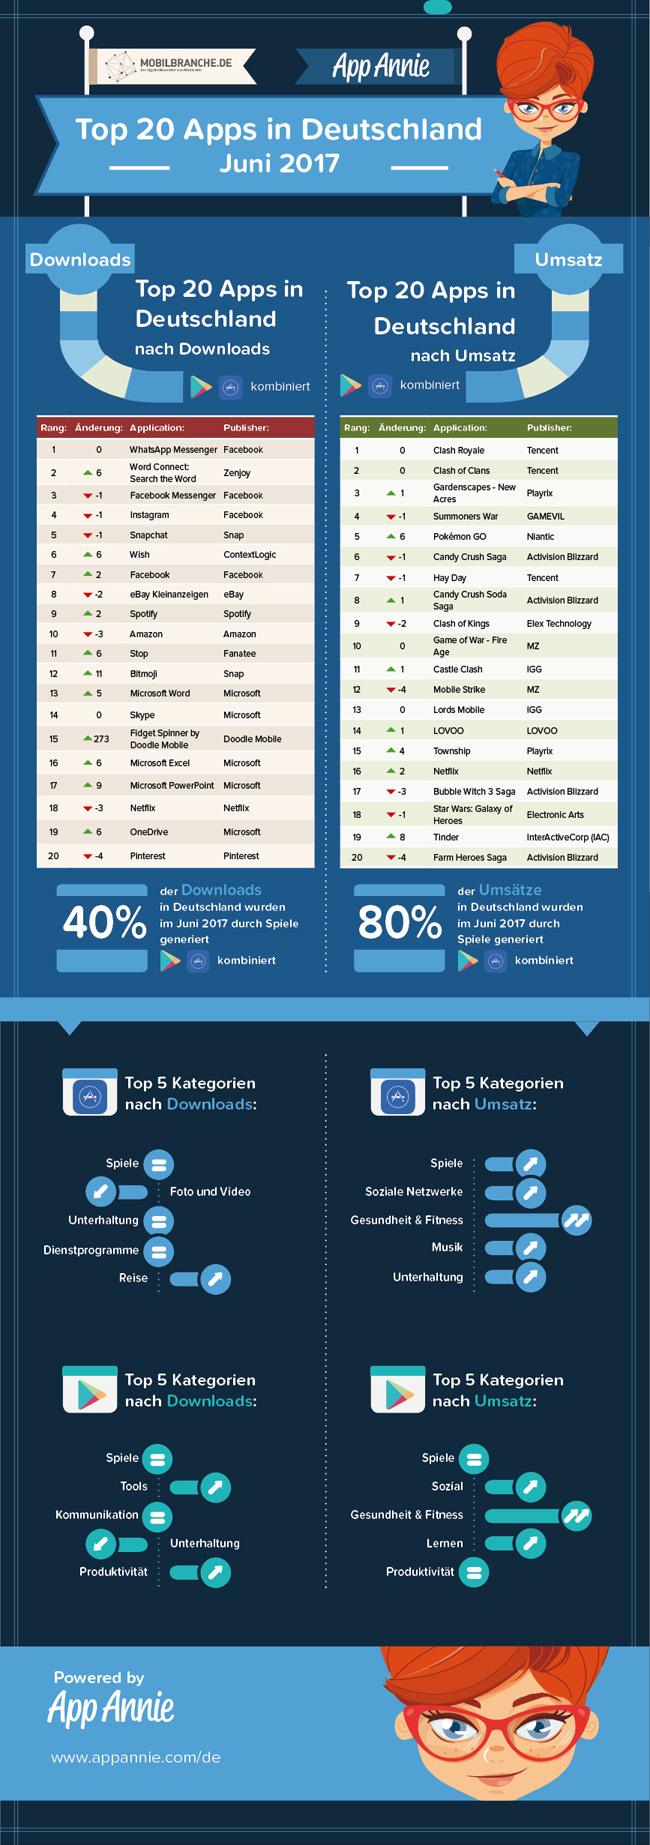 Ranking Top 20 Apps App Annie Juni 2017